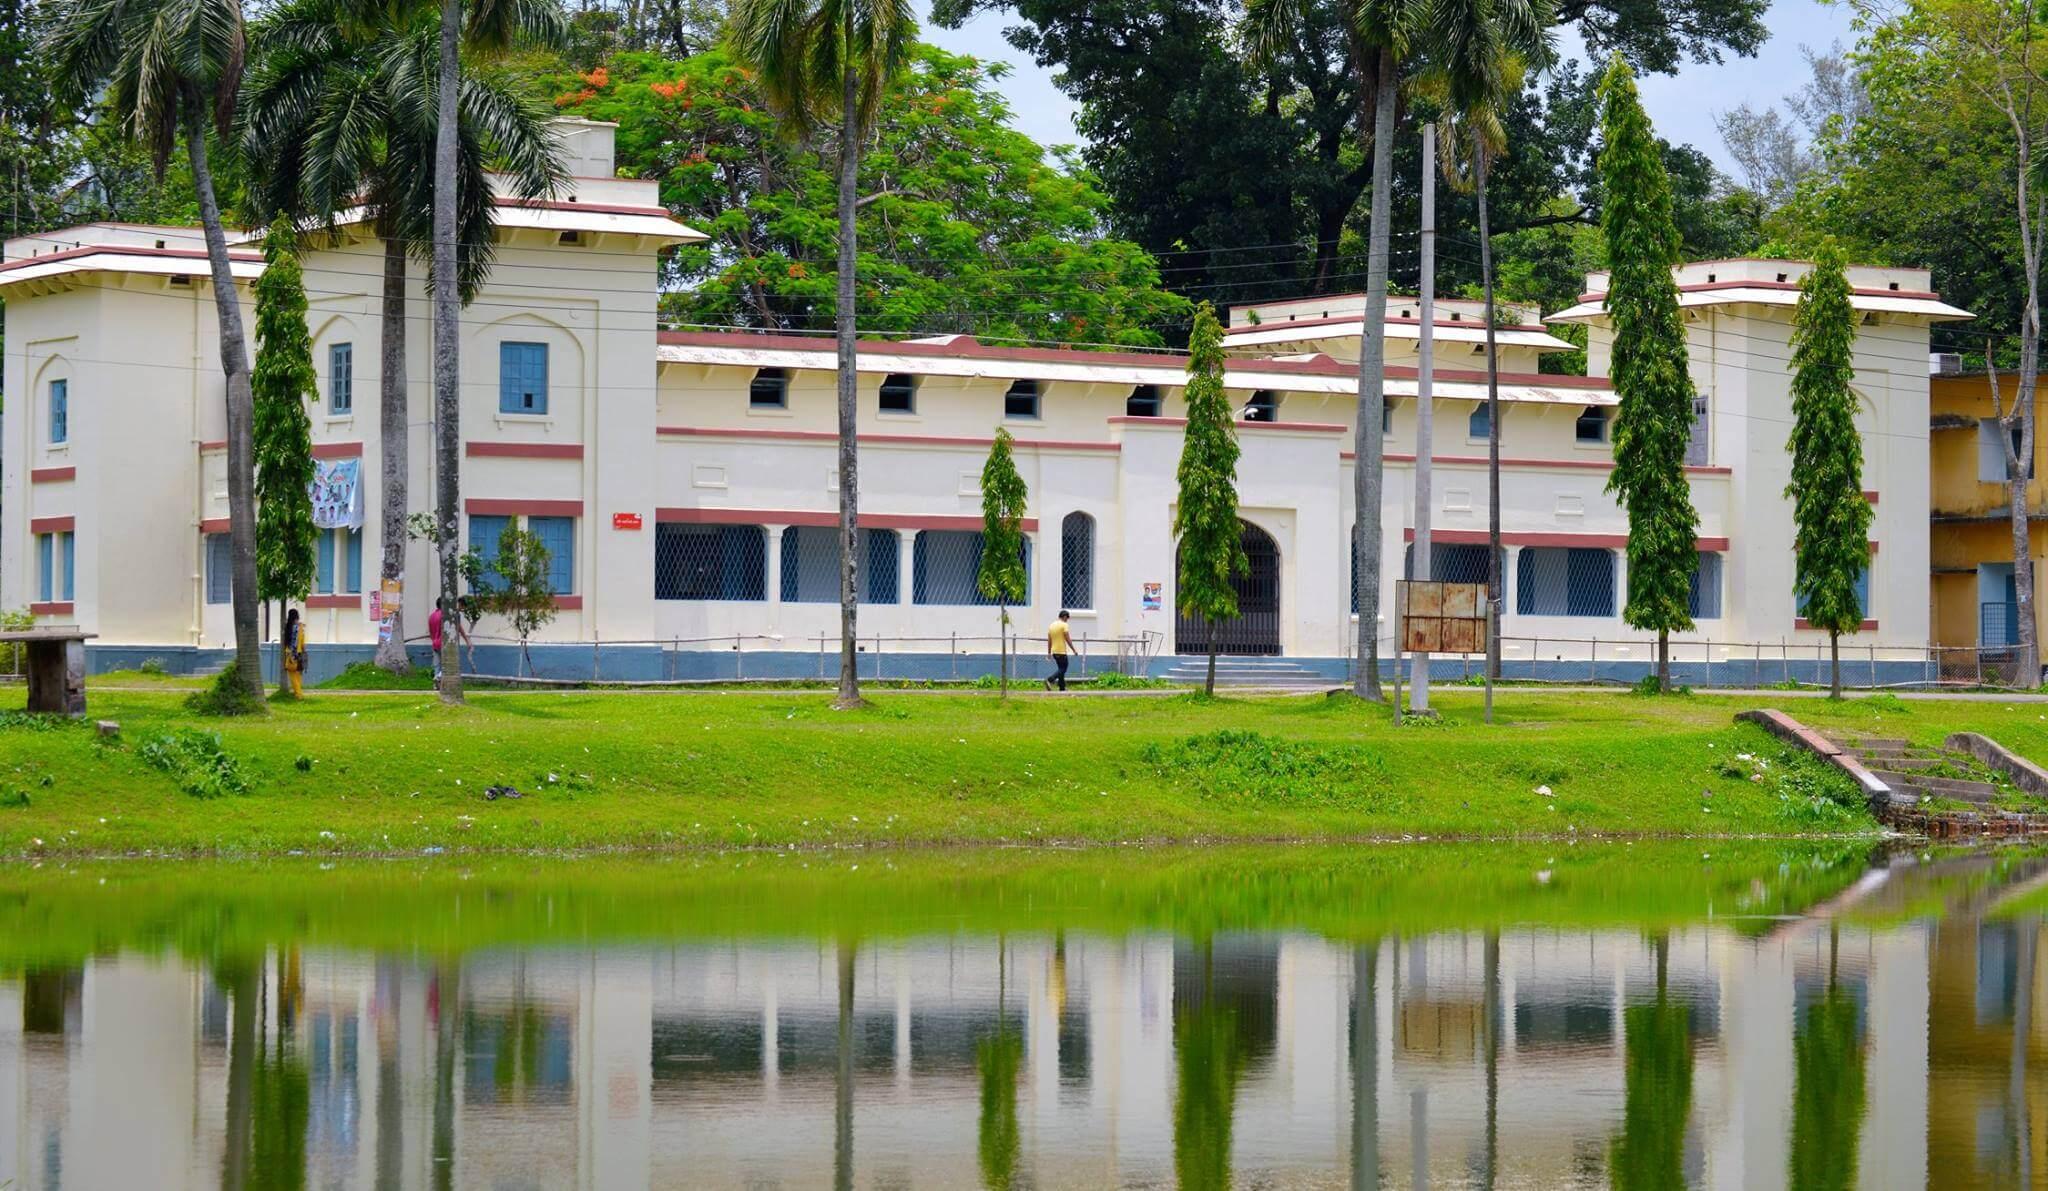 Govt. M. C. College Inside